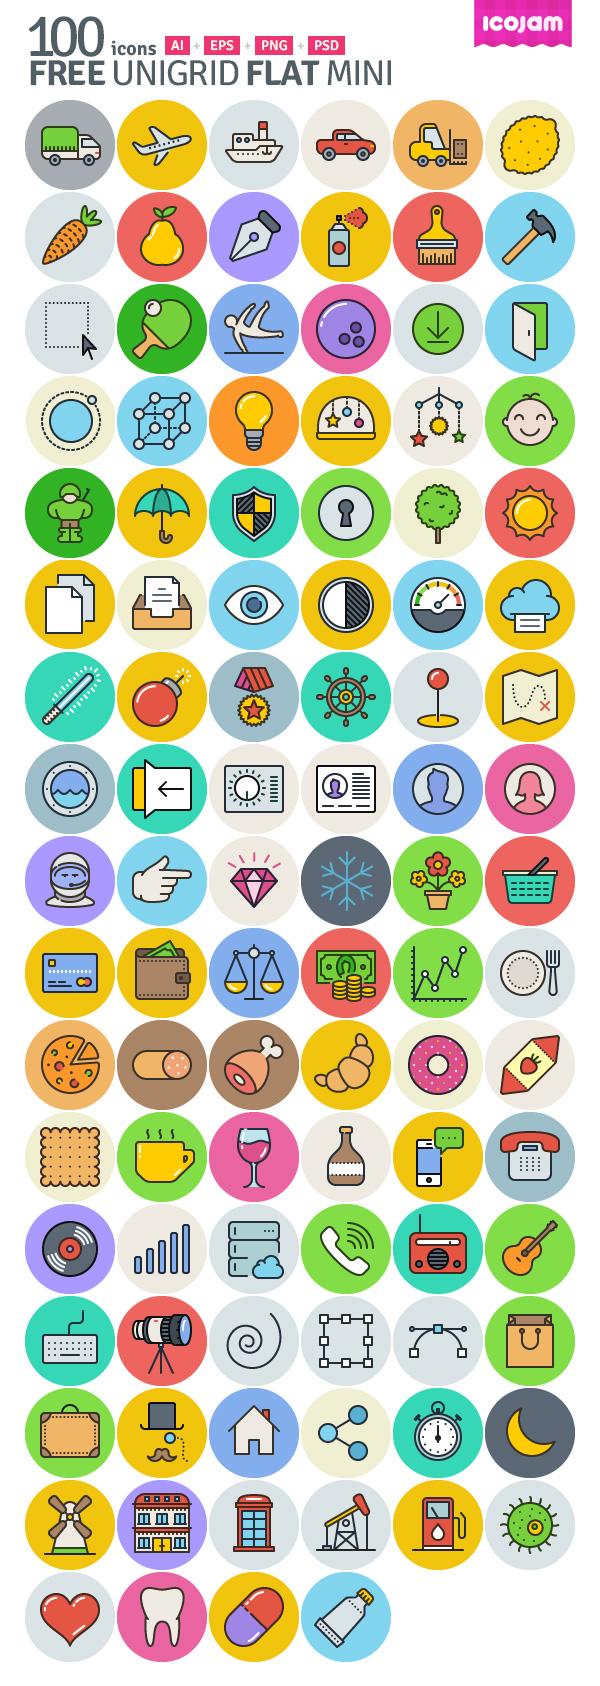 100 free Unigrid Flat Vector Icons